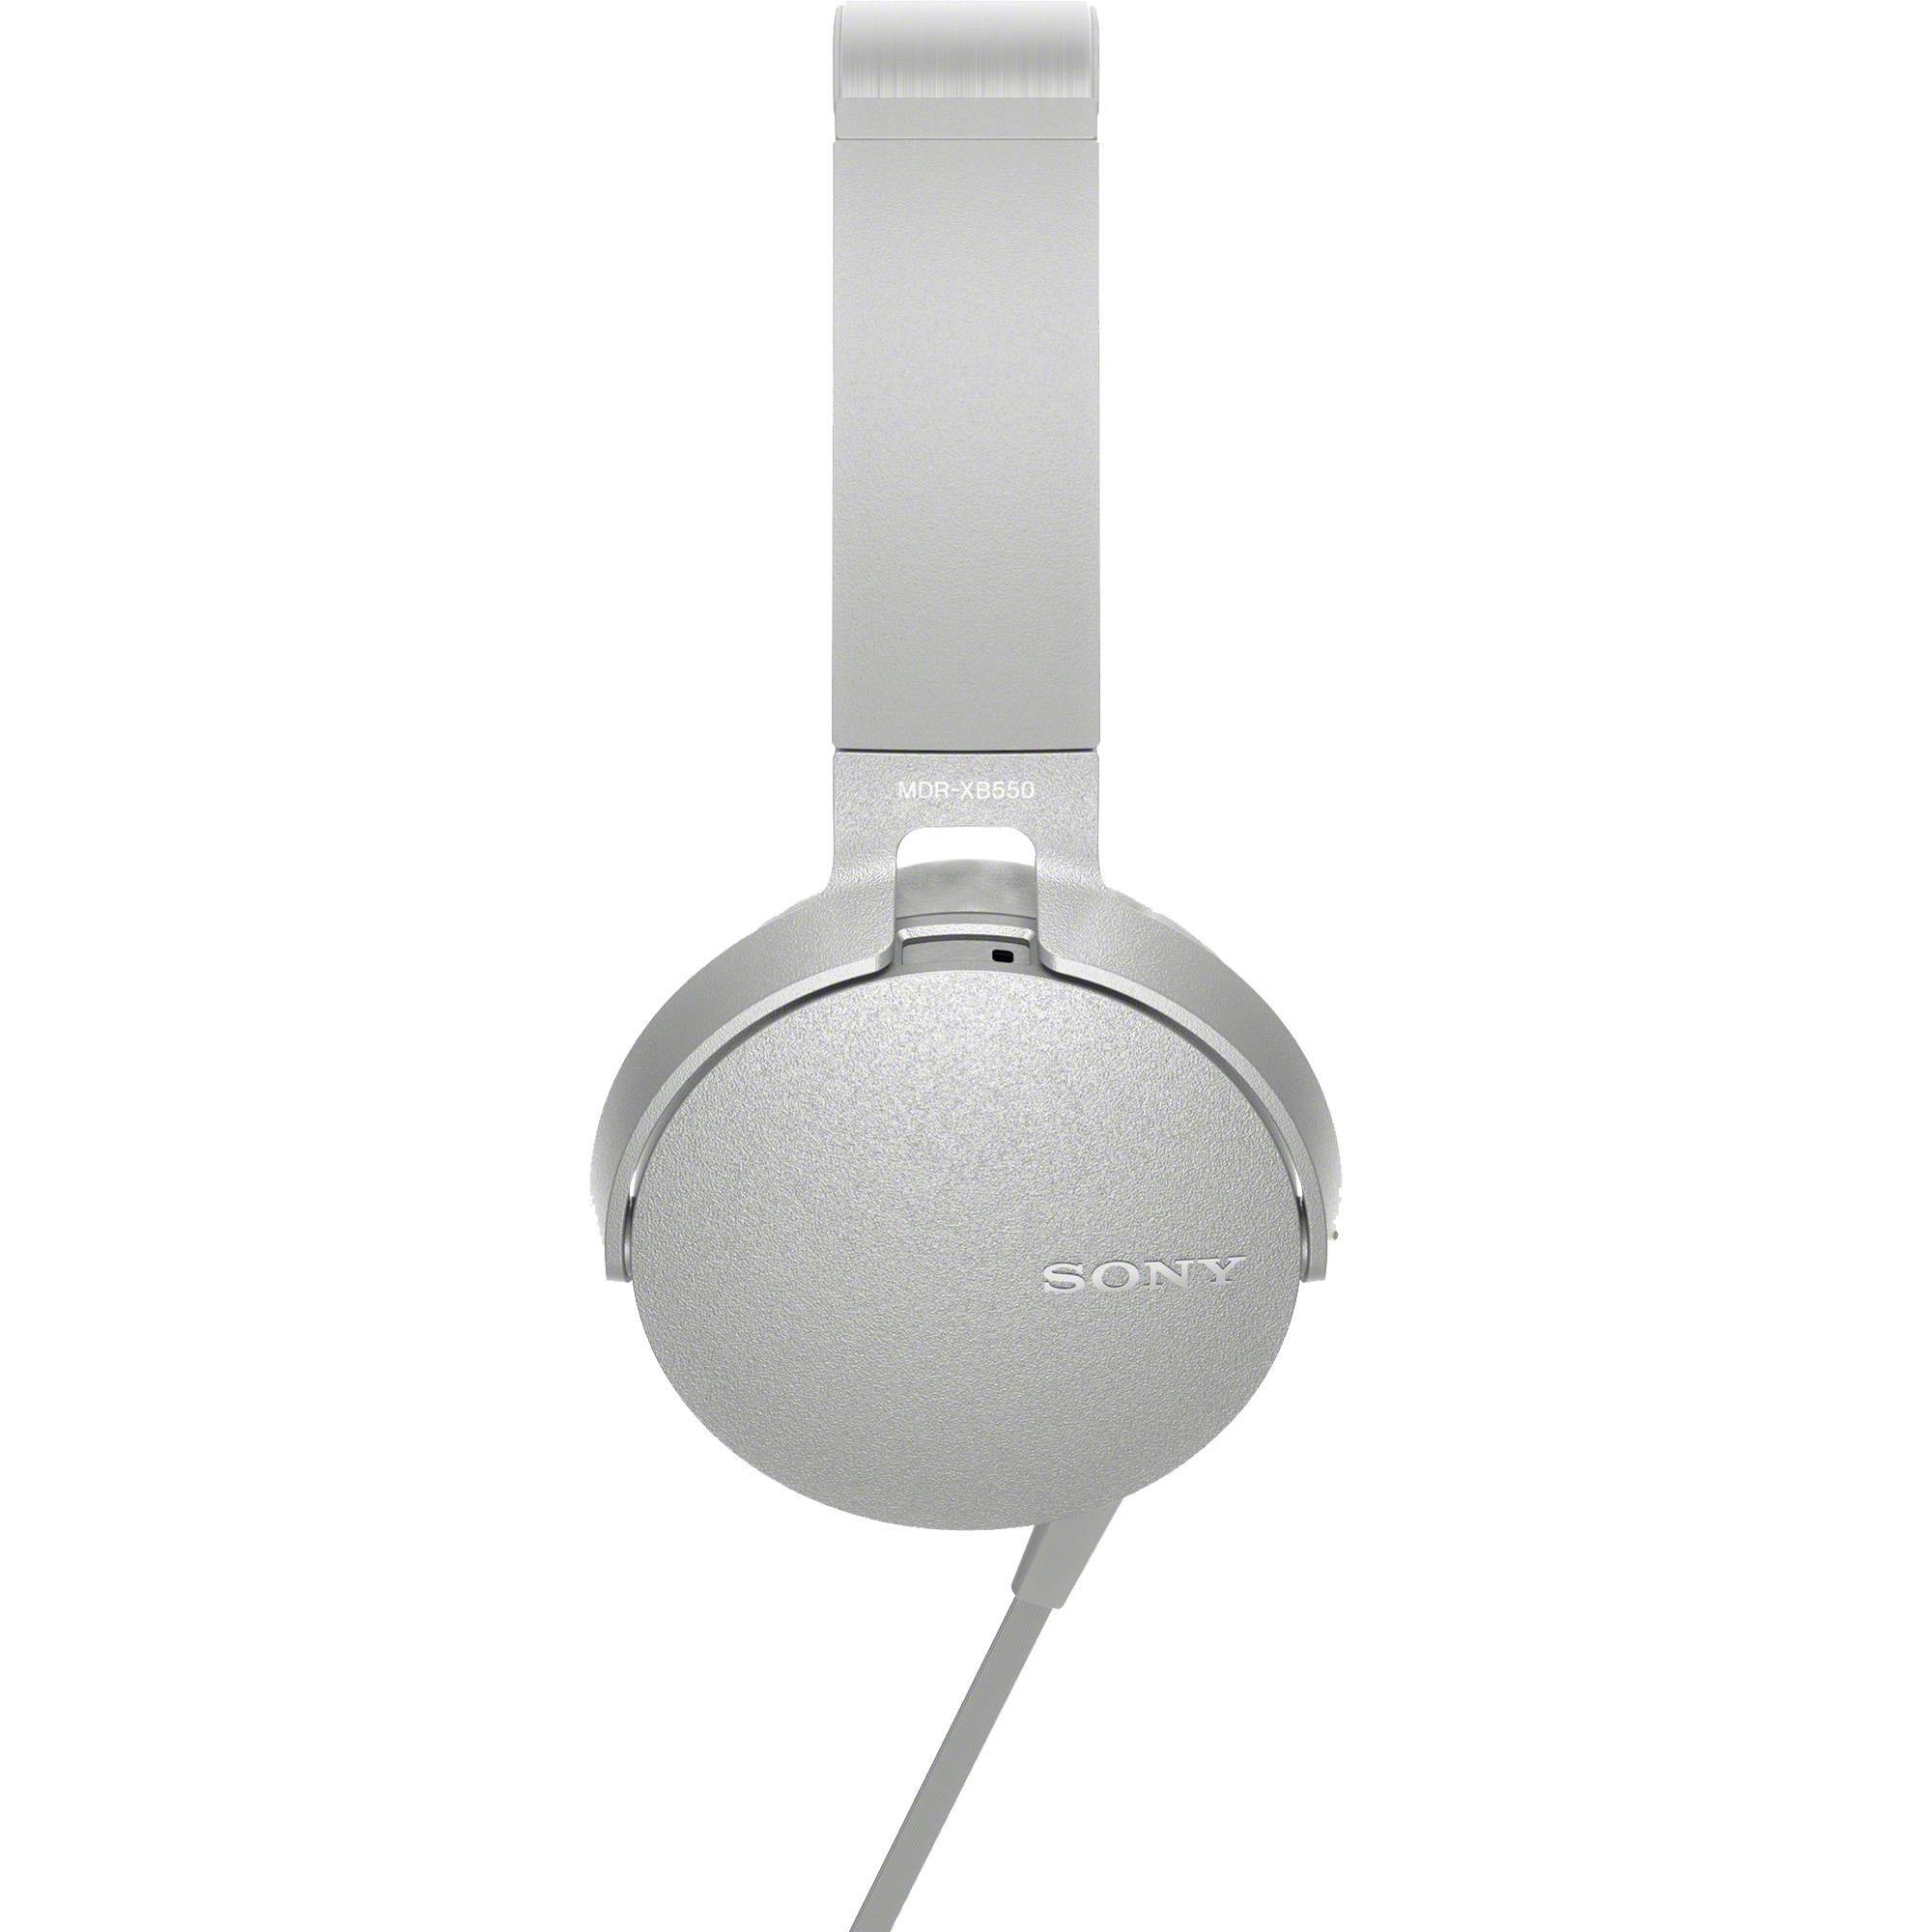 Fone de Ouvido com Microfone MDR-XB550AP/W Branco SONY